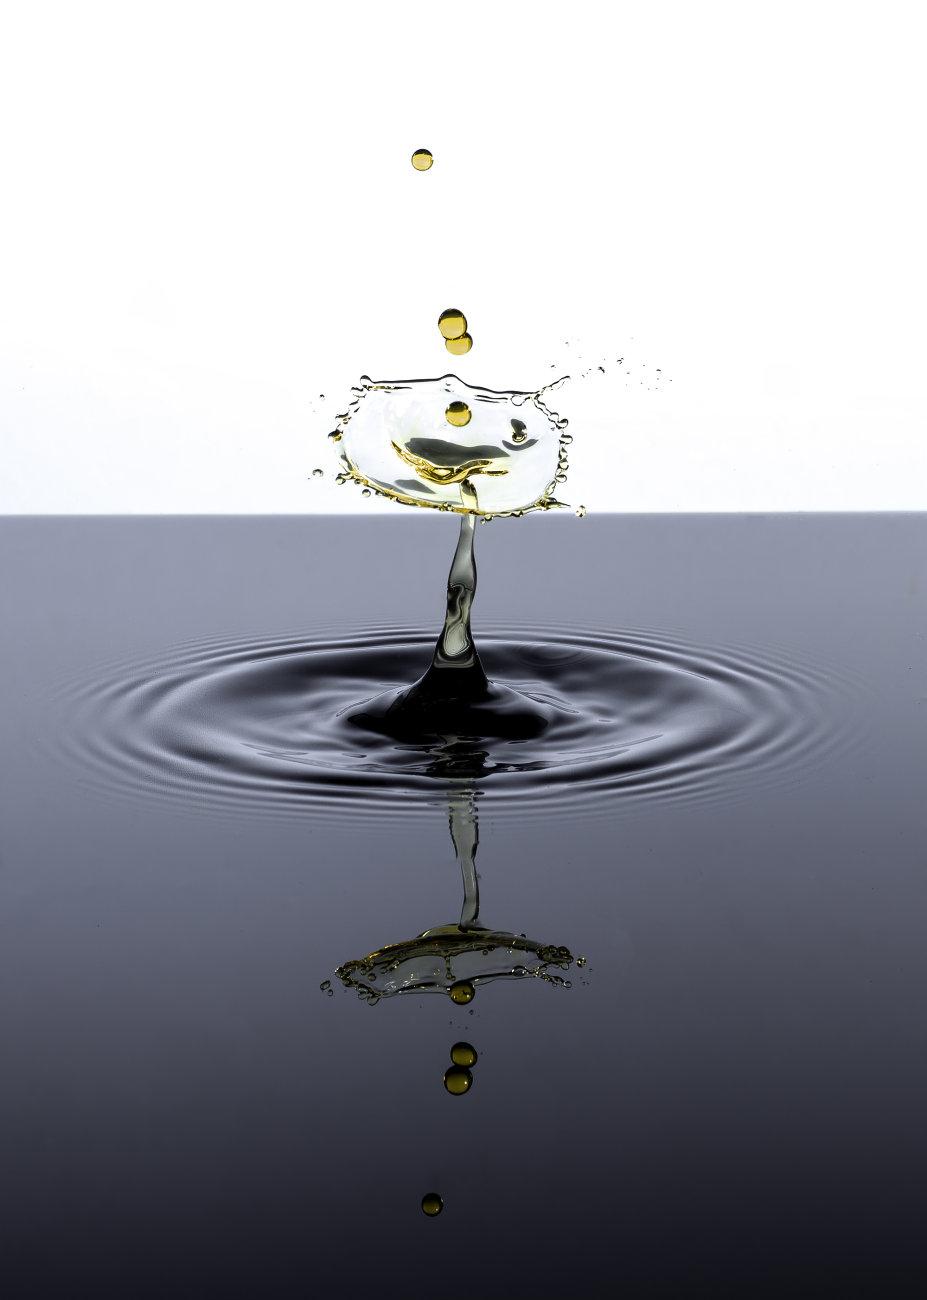 The Gold Splash